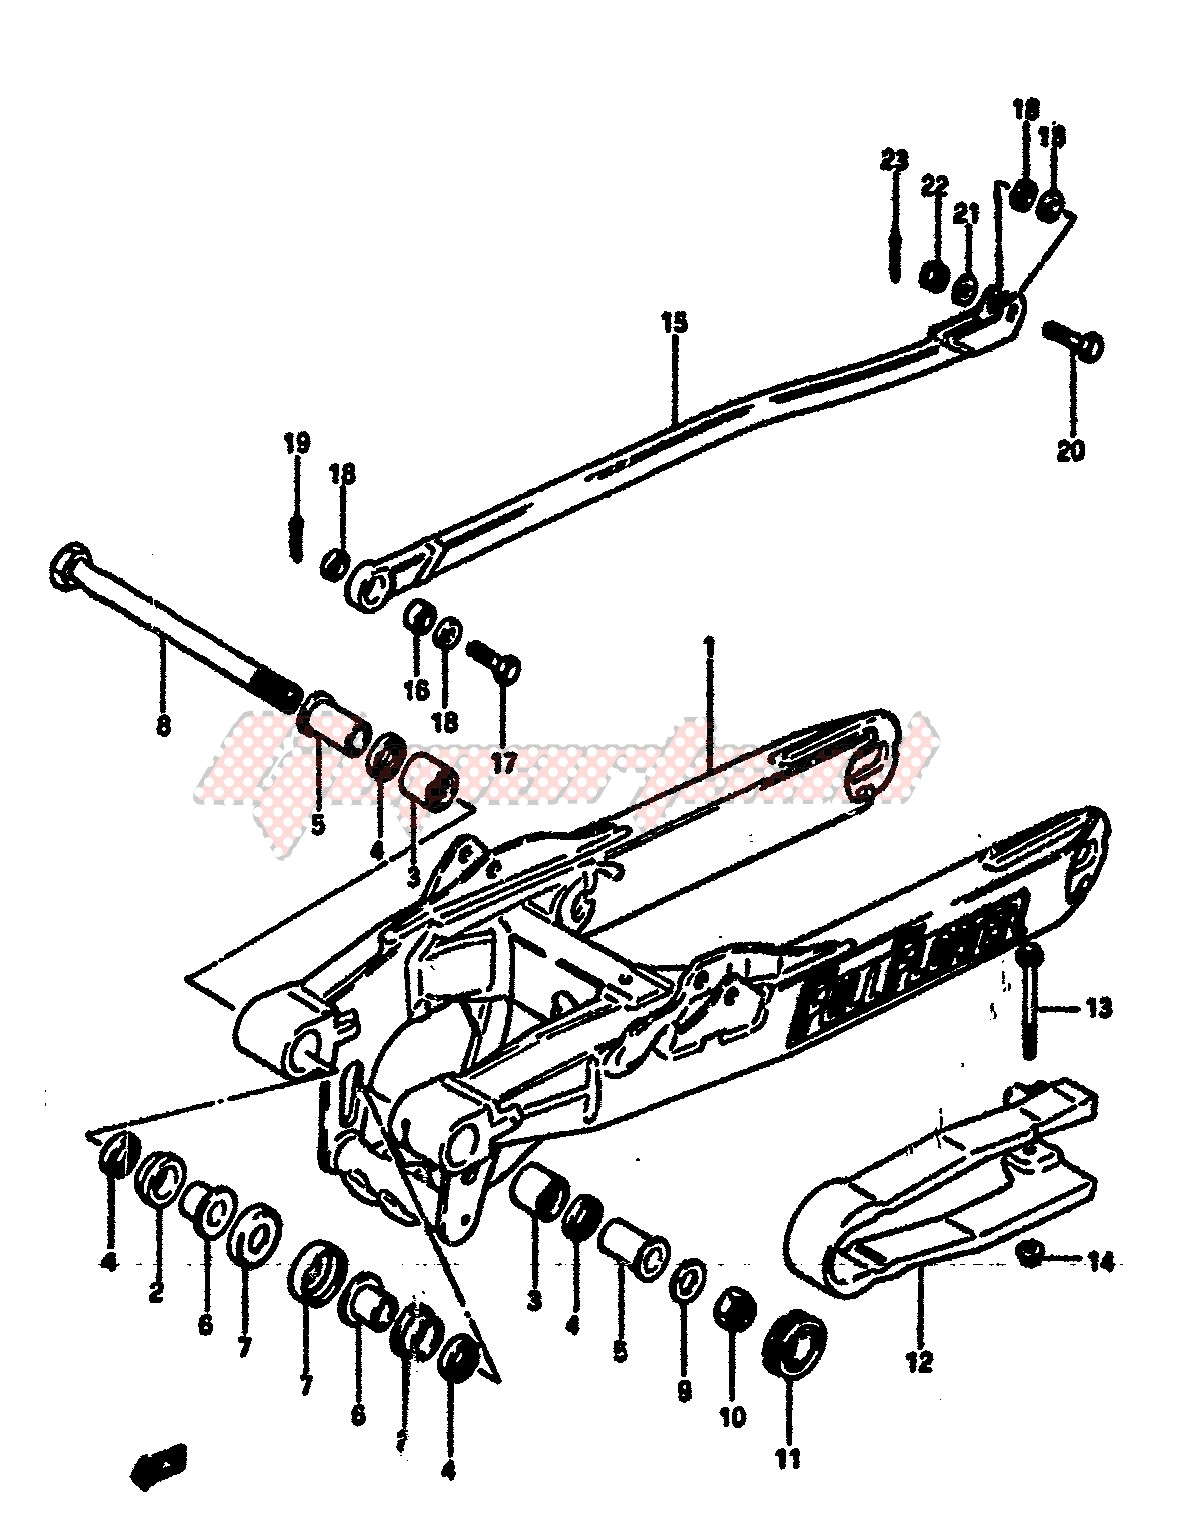 REAR SWINGING ARM blueprint